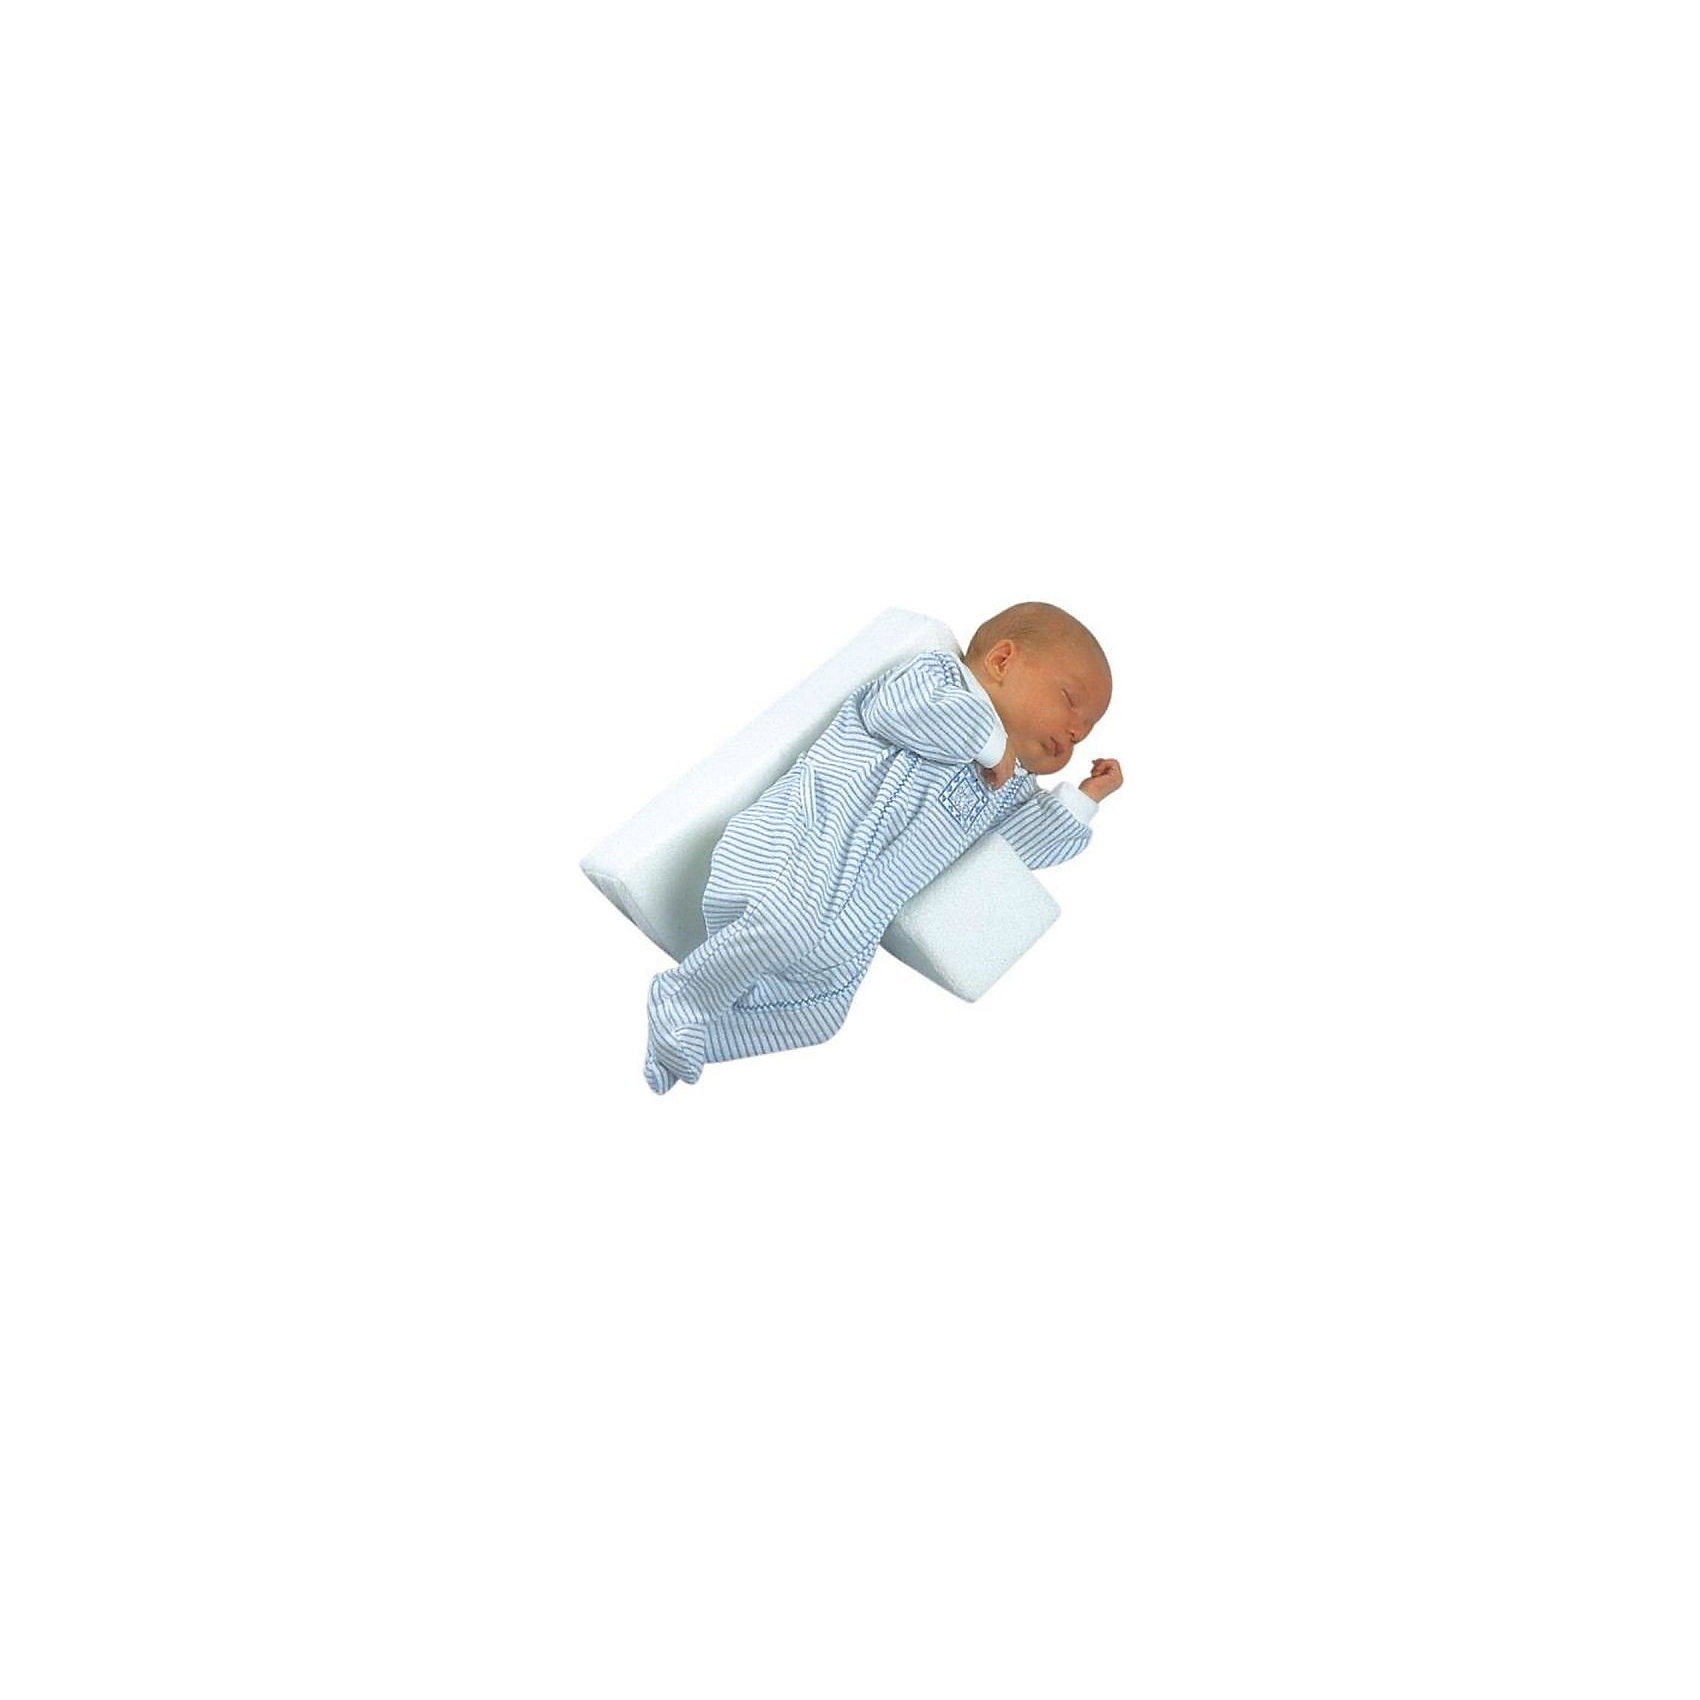 �������-��������� Baby sleep, PLANTEX (Plantex)